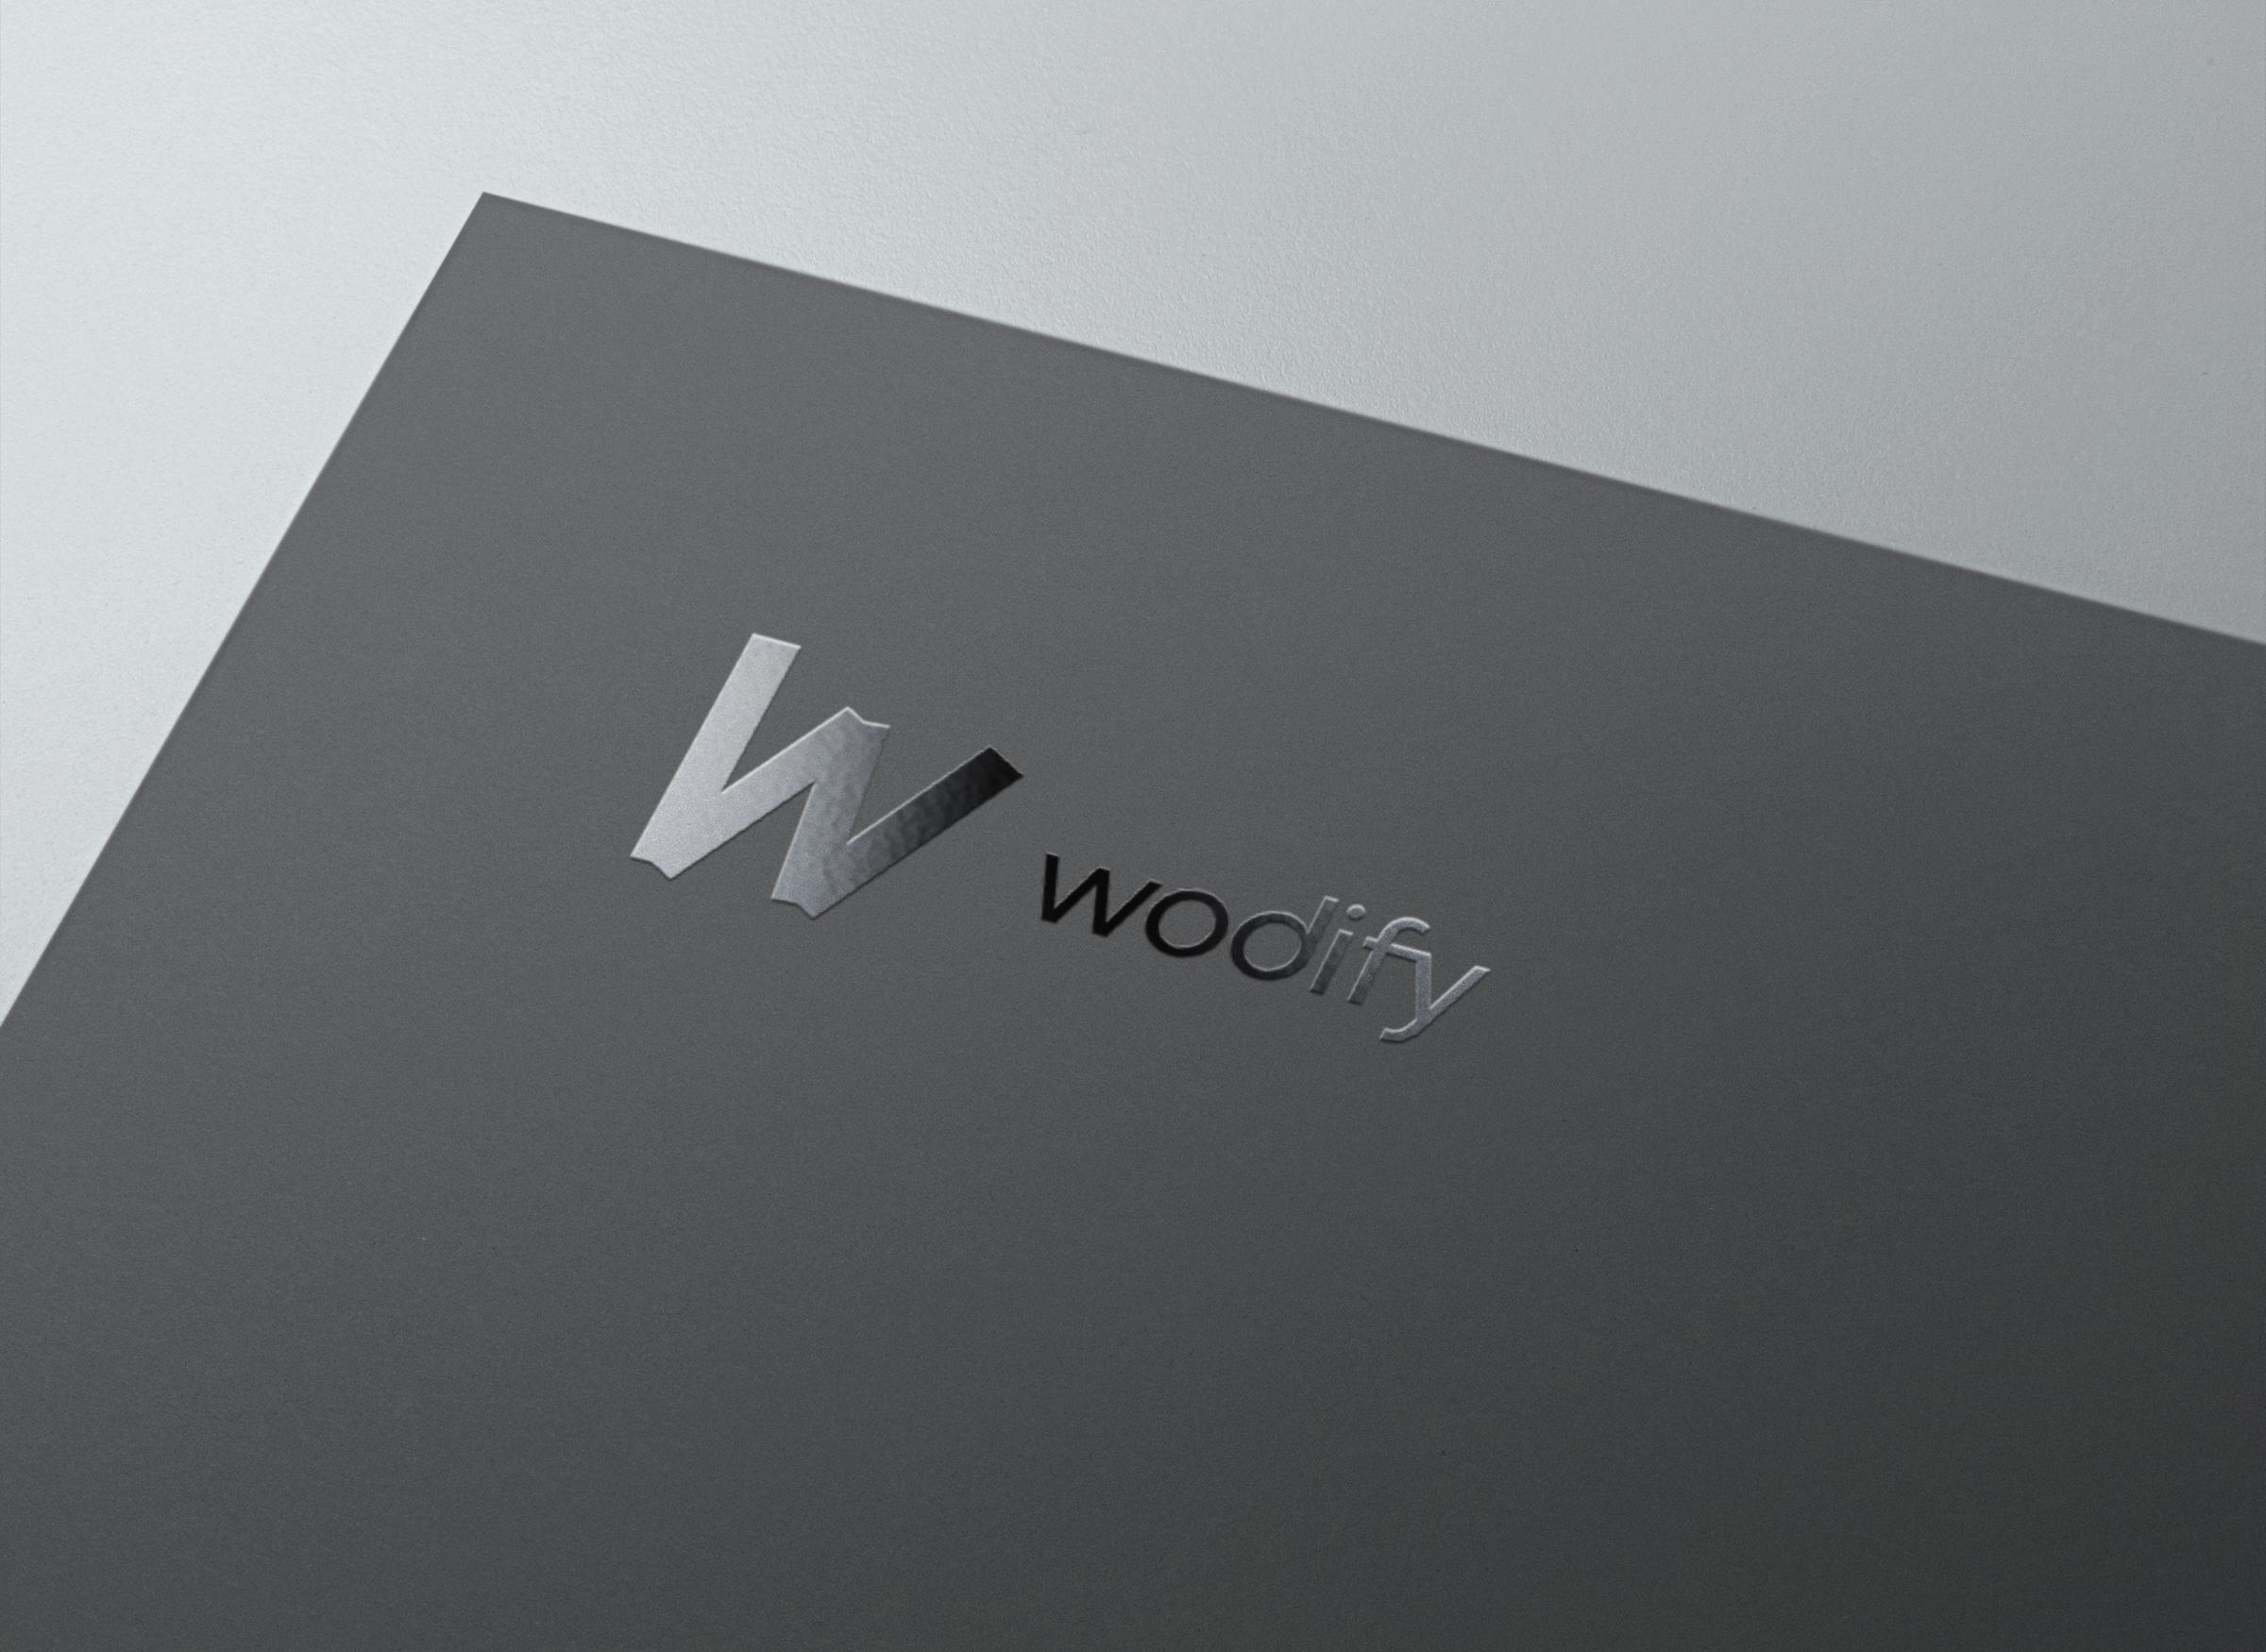 wodify_detail.jpg